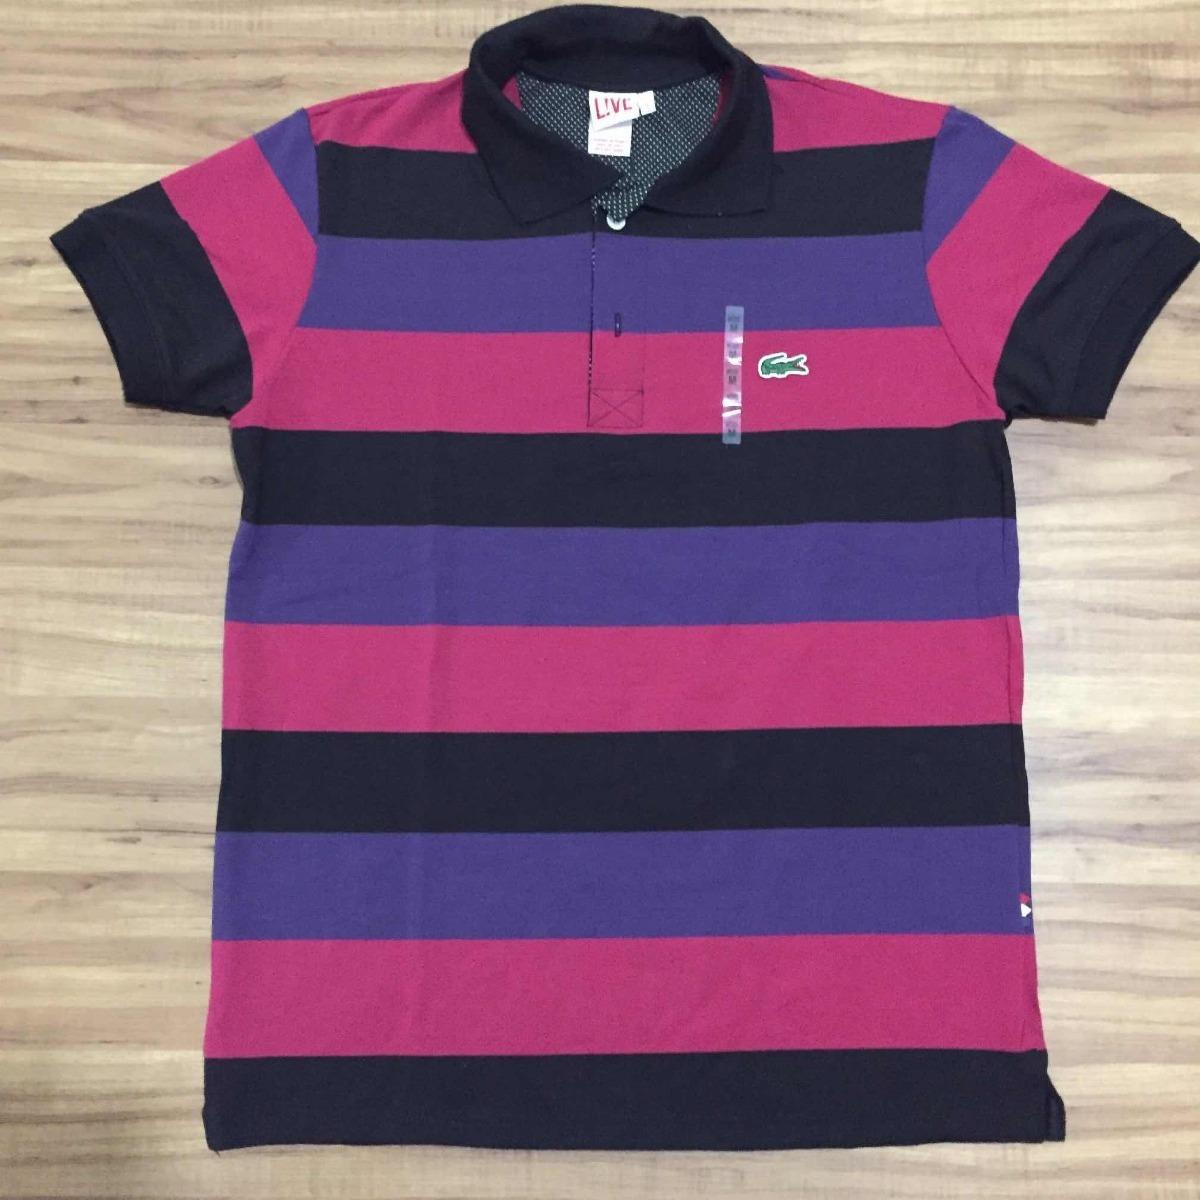 bc4ea1ecdd62b camisa polo lacoste original lcst live peruana slim fit. Carregando zoom.